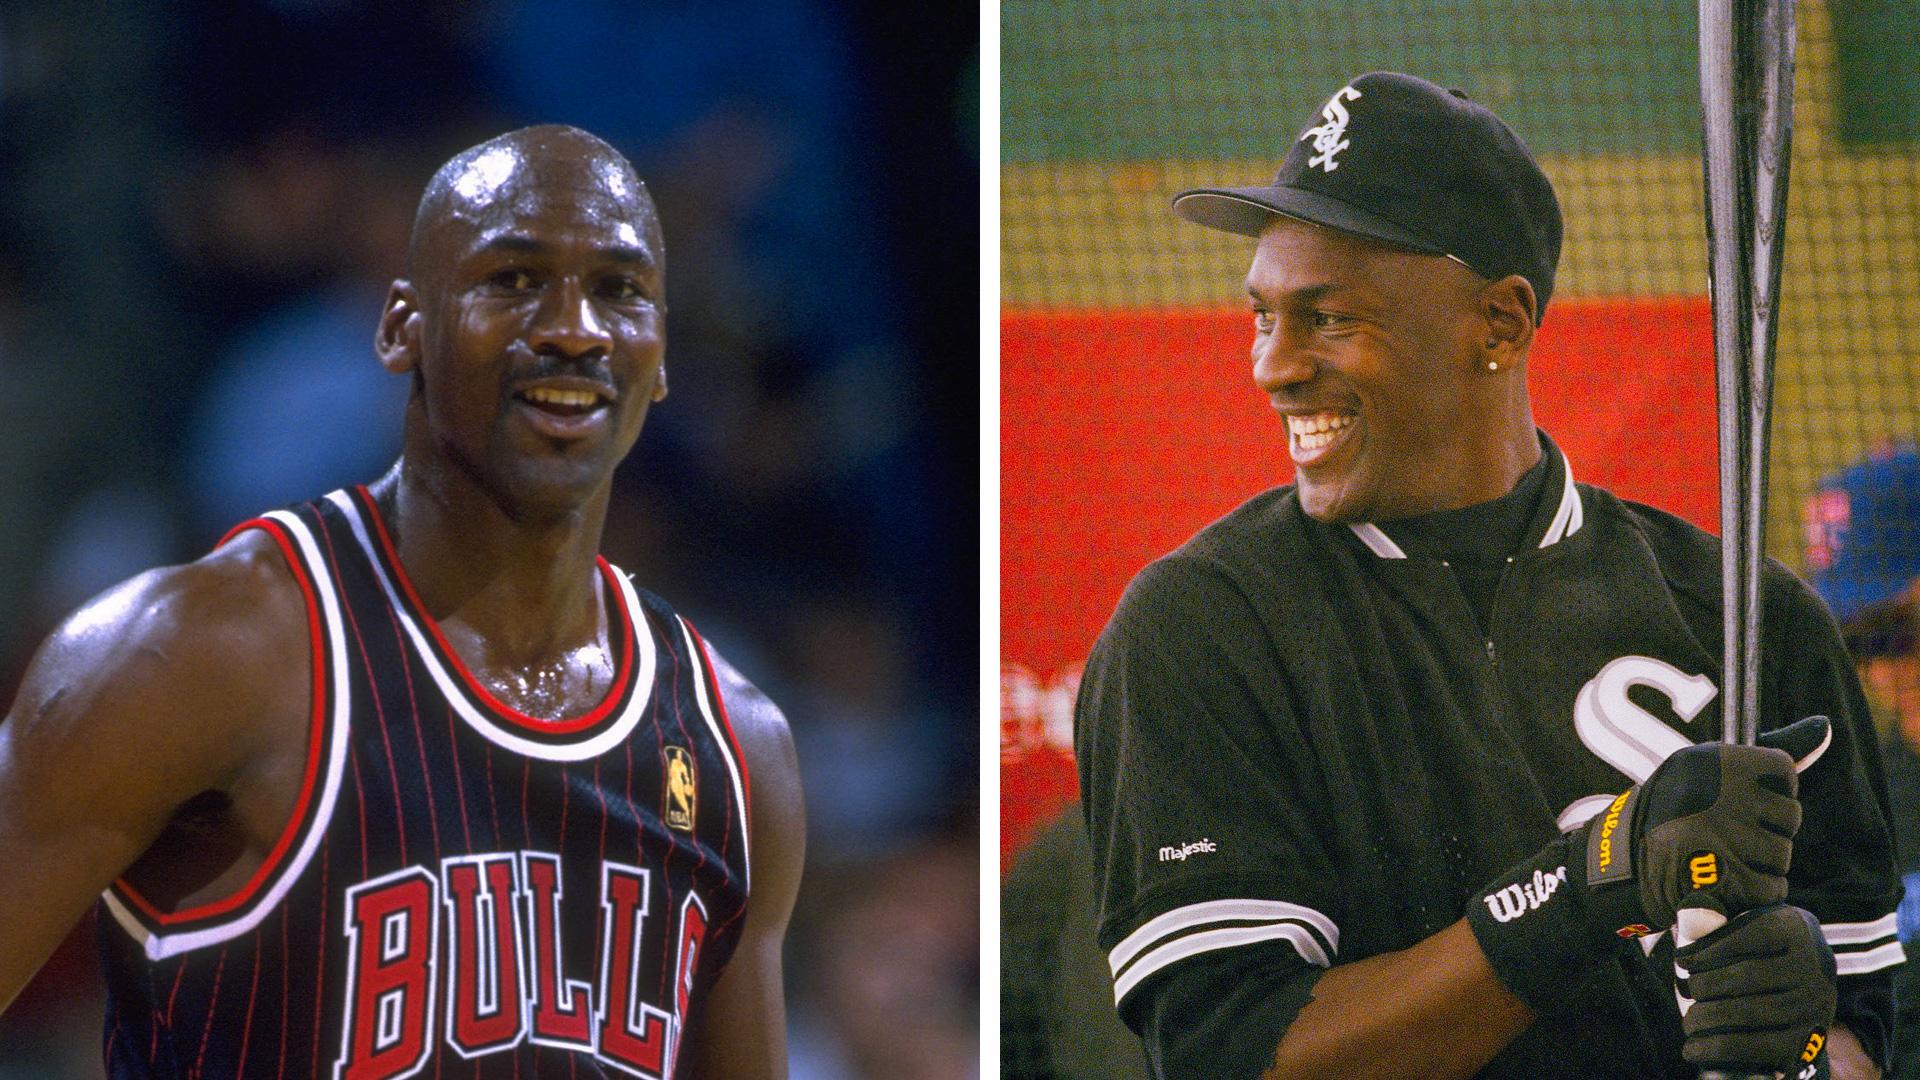 dcpcgm Be like Mike: 12 athletes who played basketball and baseball